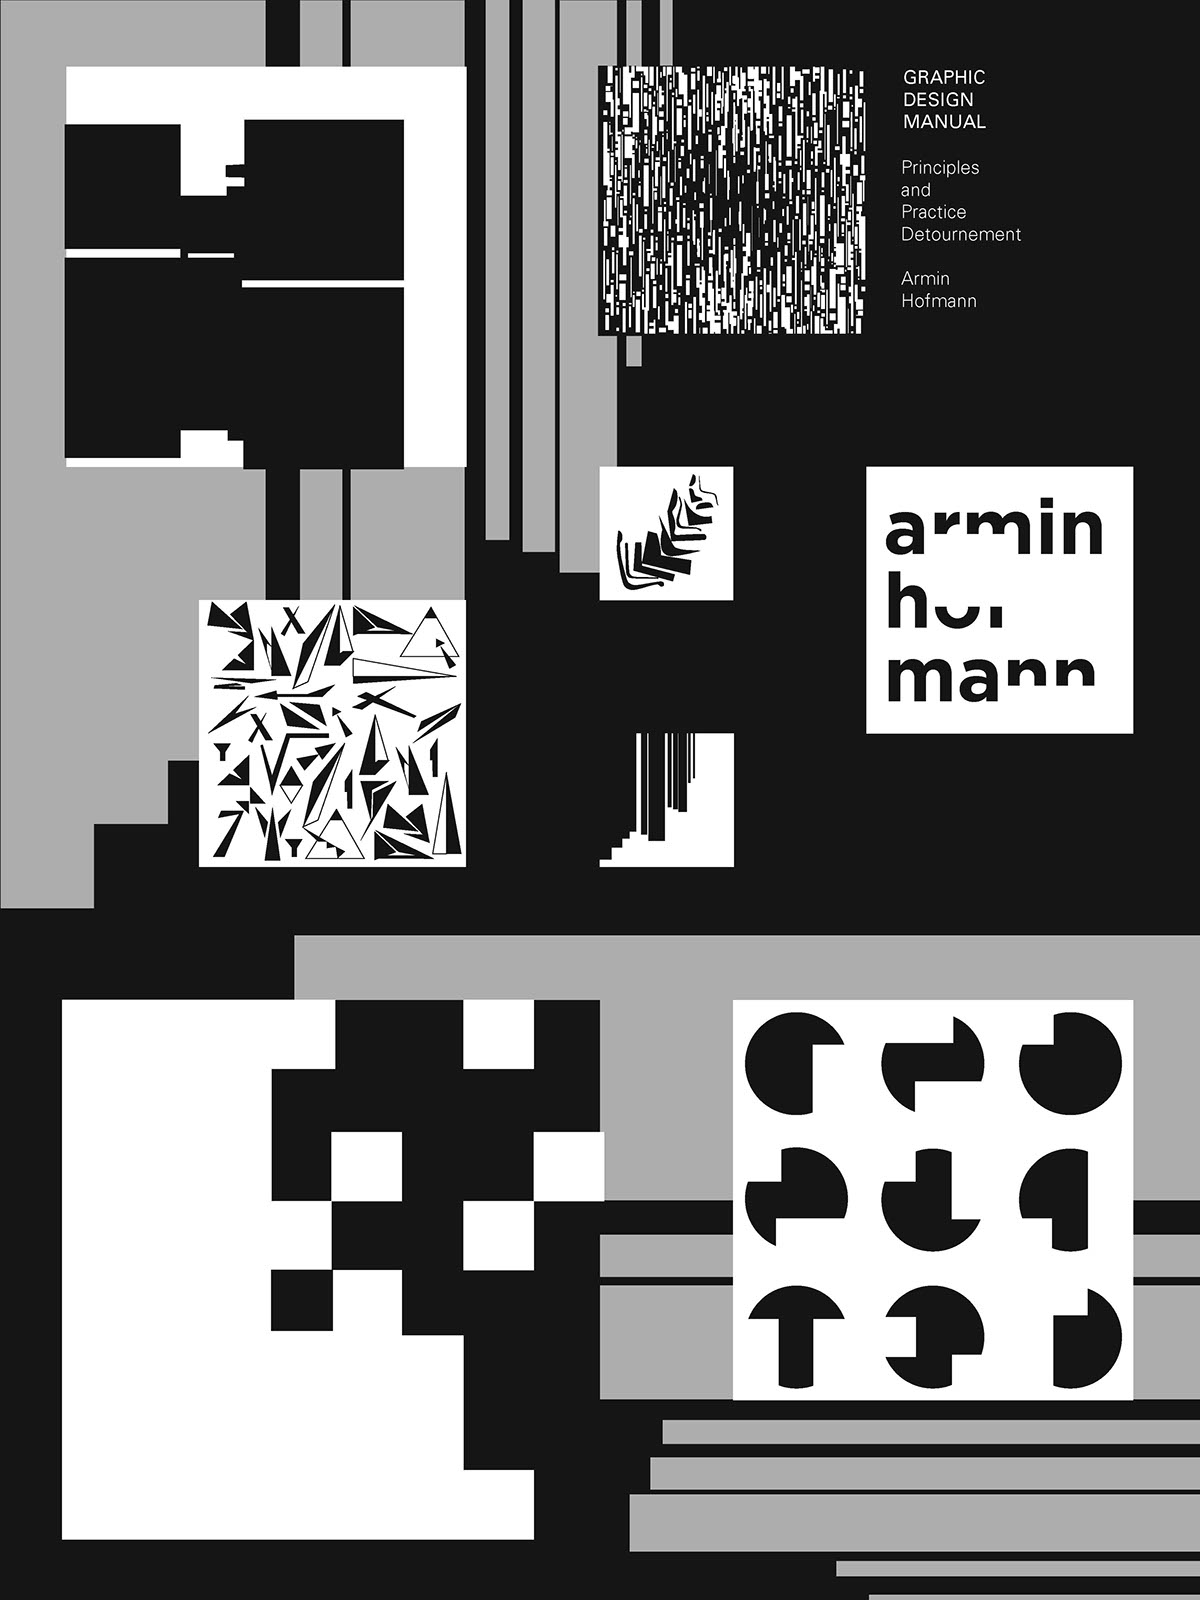 Armin hofmann detournement on behance for Armin hofmann